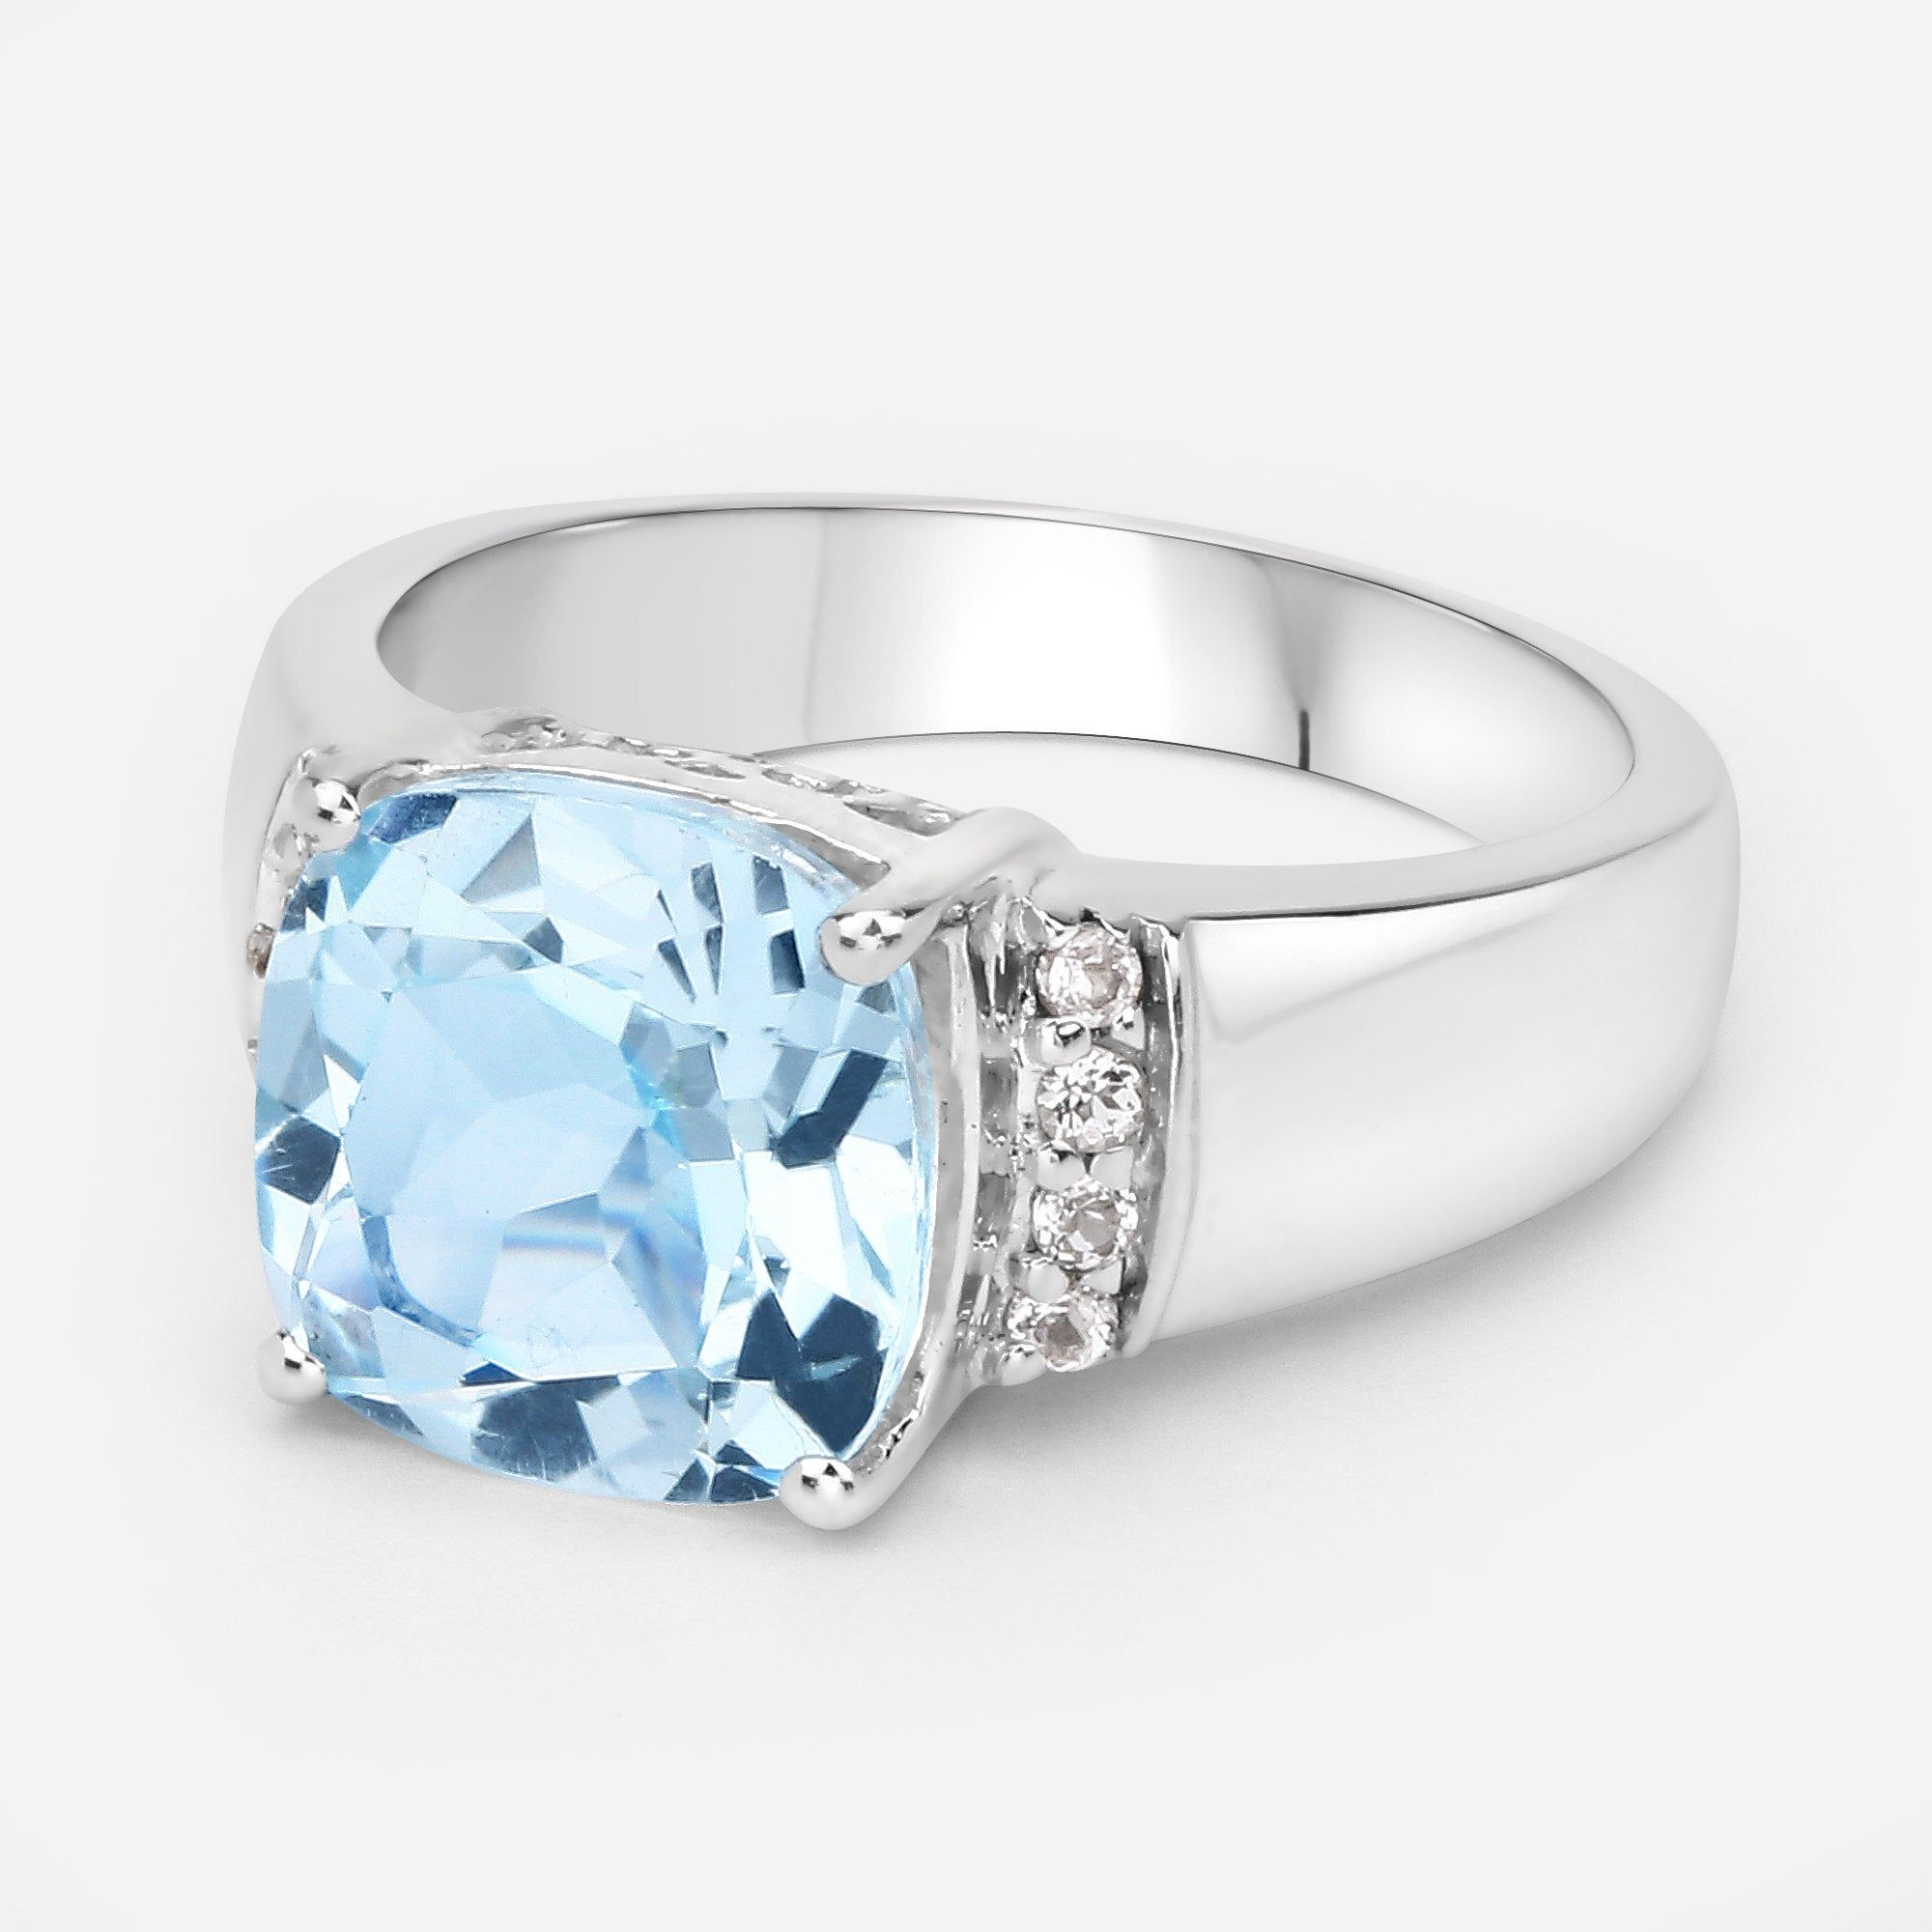 Cushion Halo December Birthstone Ring Genuine Topaz Ring Sterling Silver Ring Sky Blue Topaz